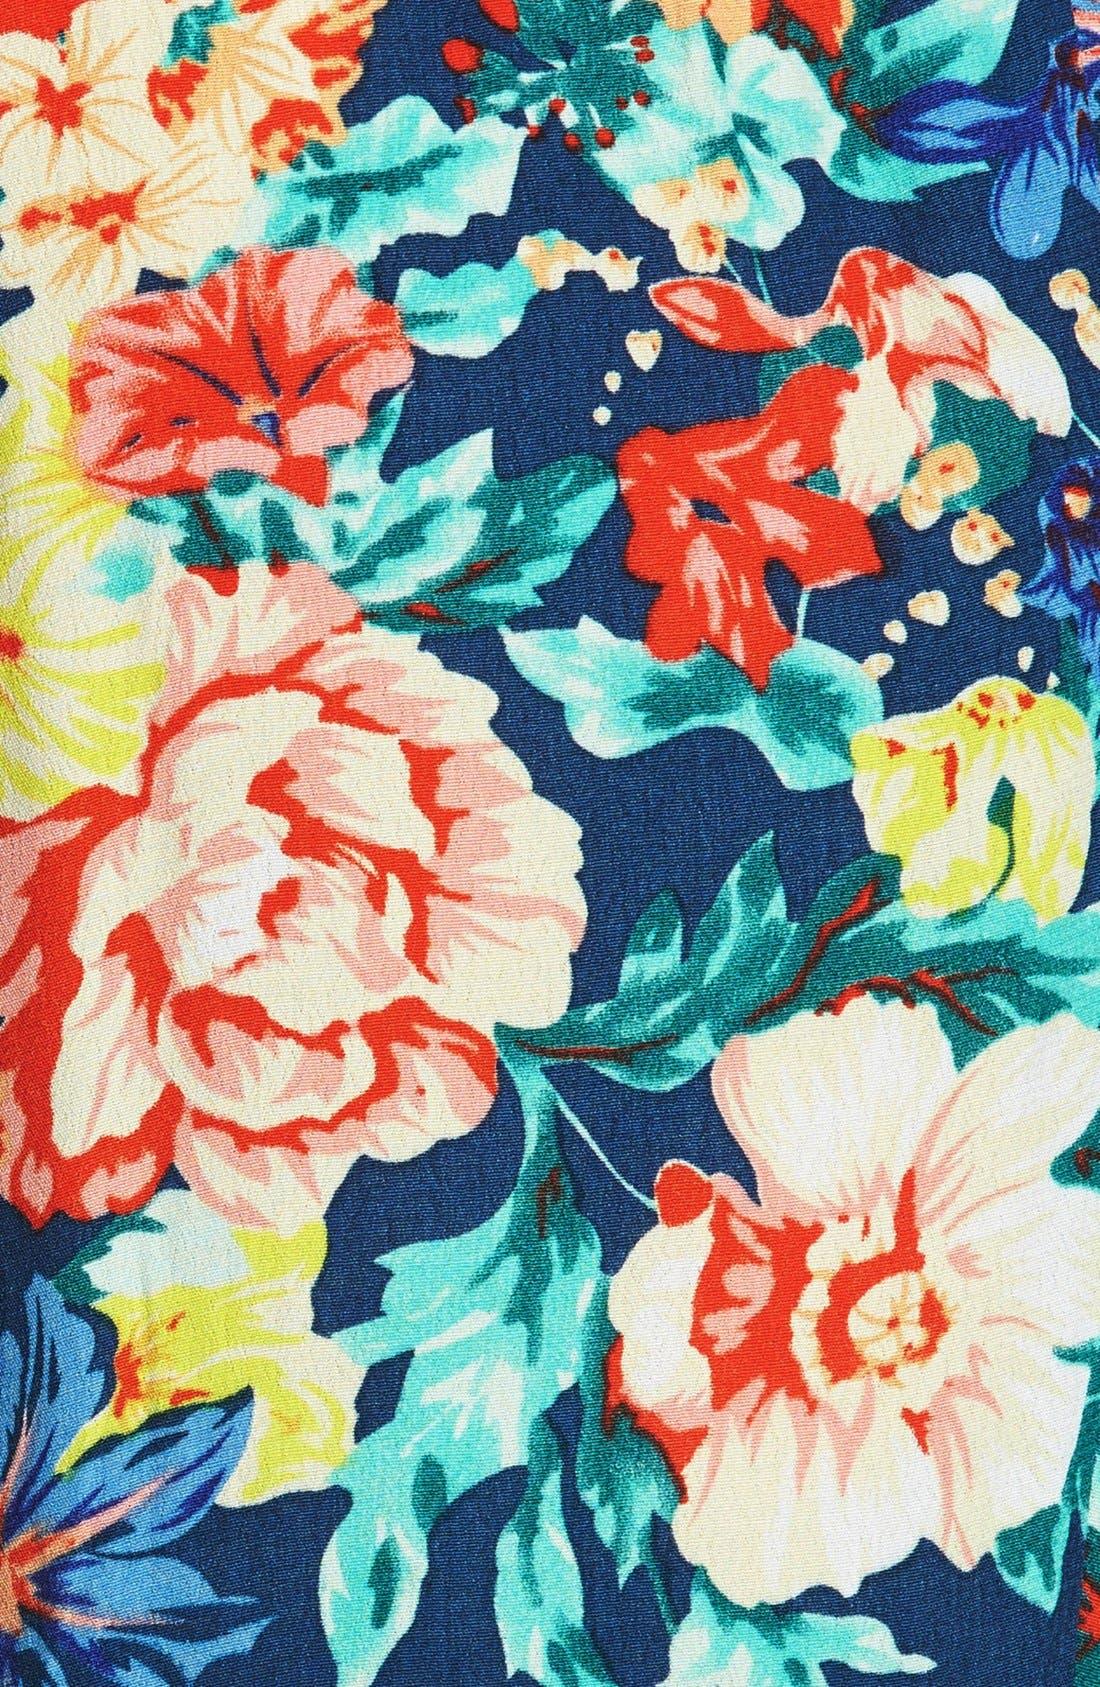 'Acid Bloom' Floral Print Jogger Pants,                             Alternate thumbnail 3, color,                             Multi